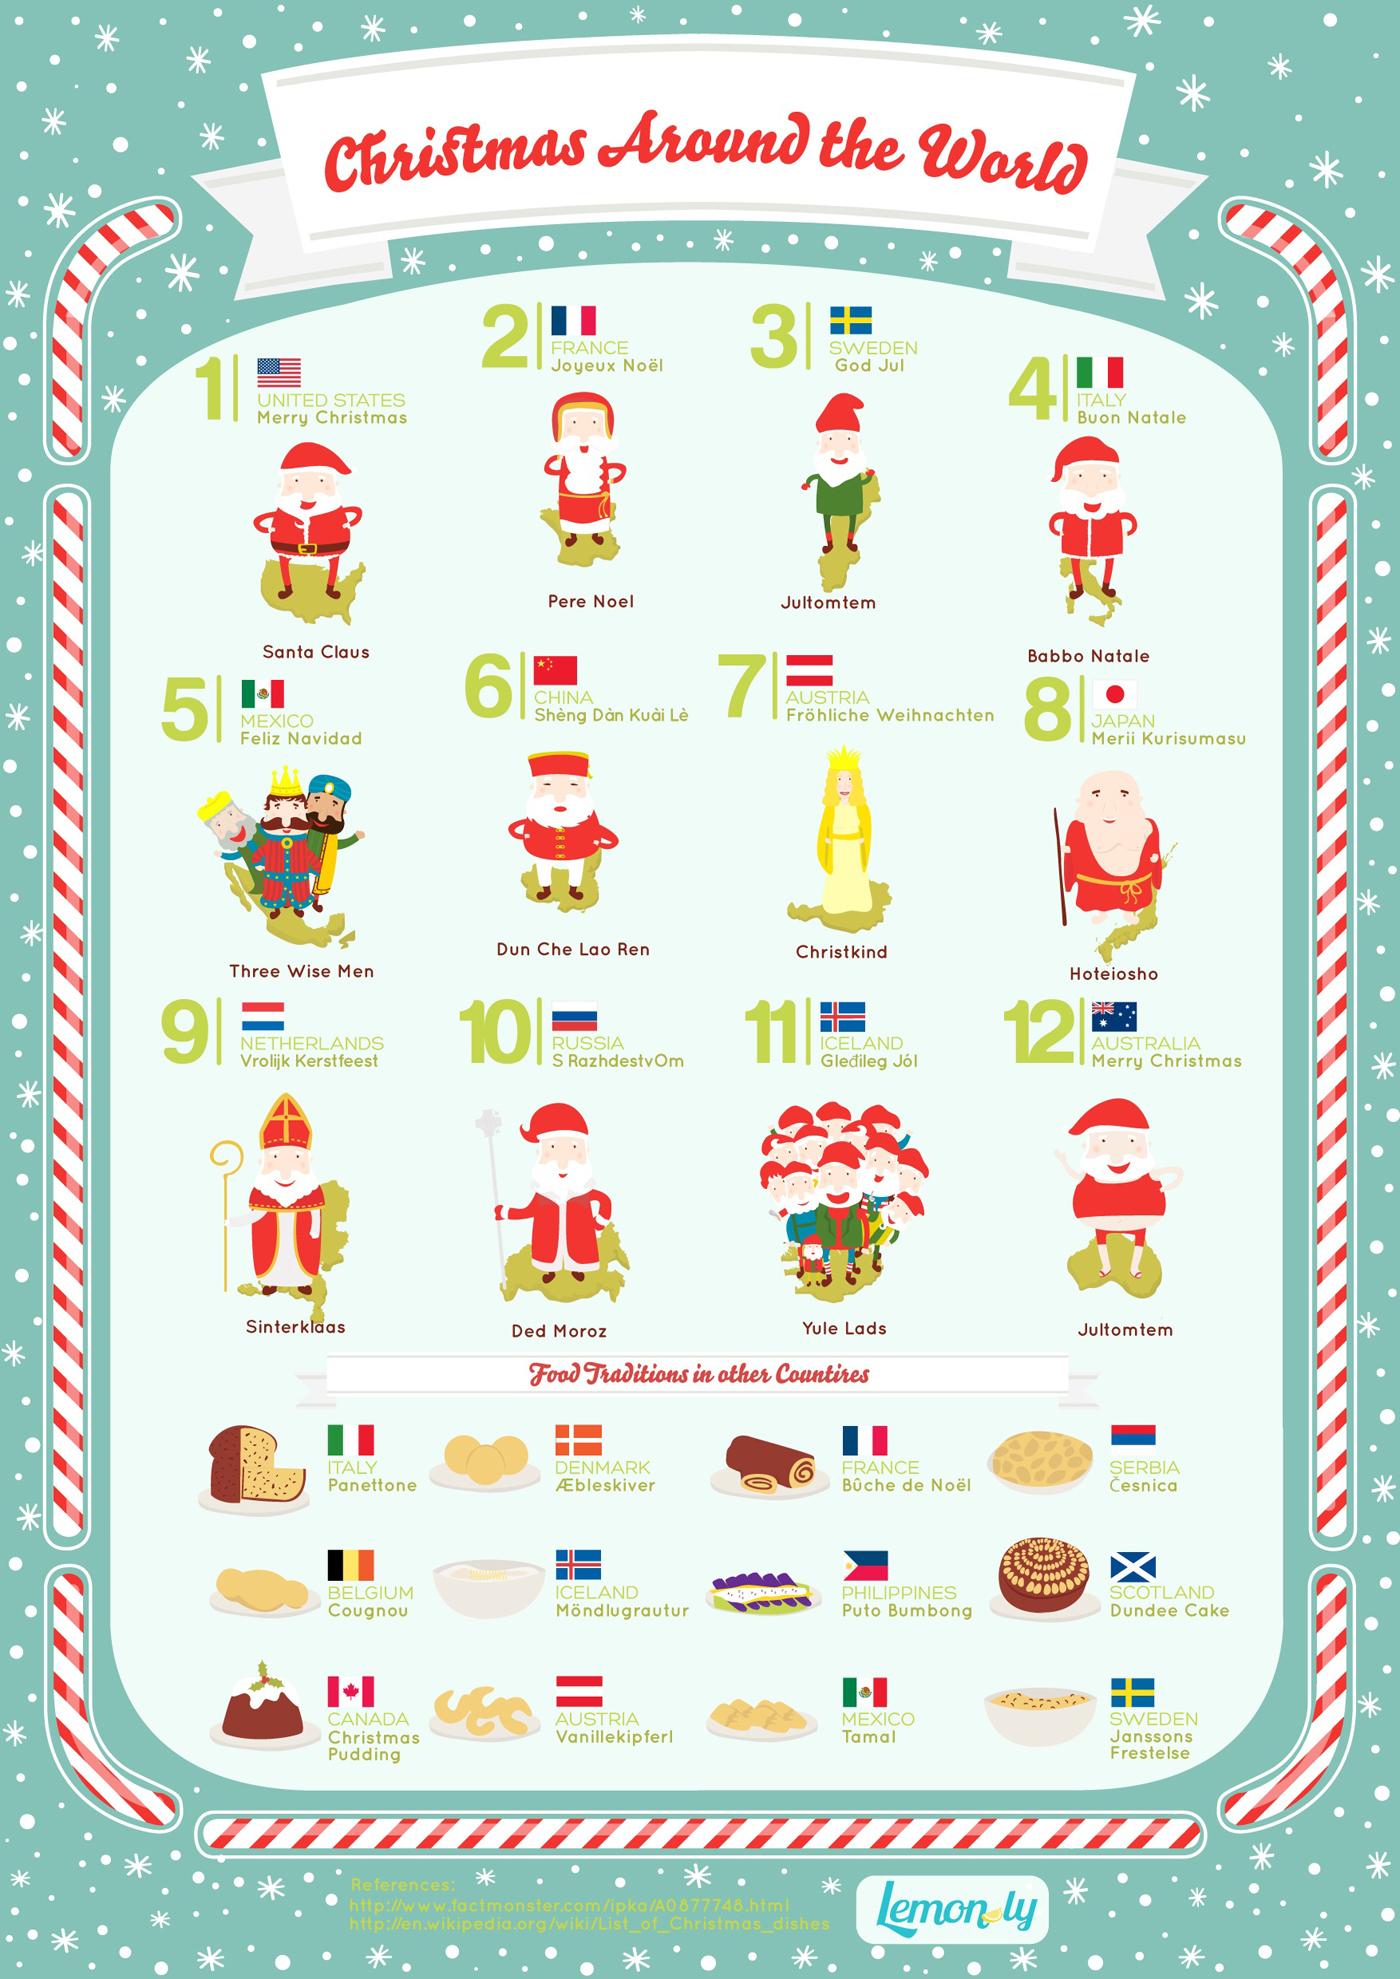 Christmas Around The World Infographic